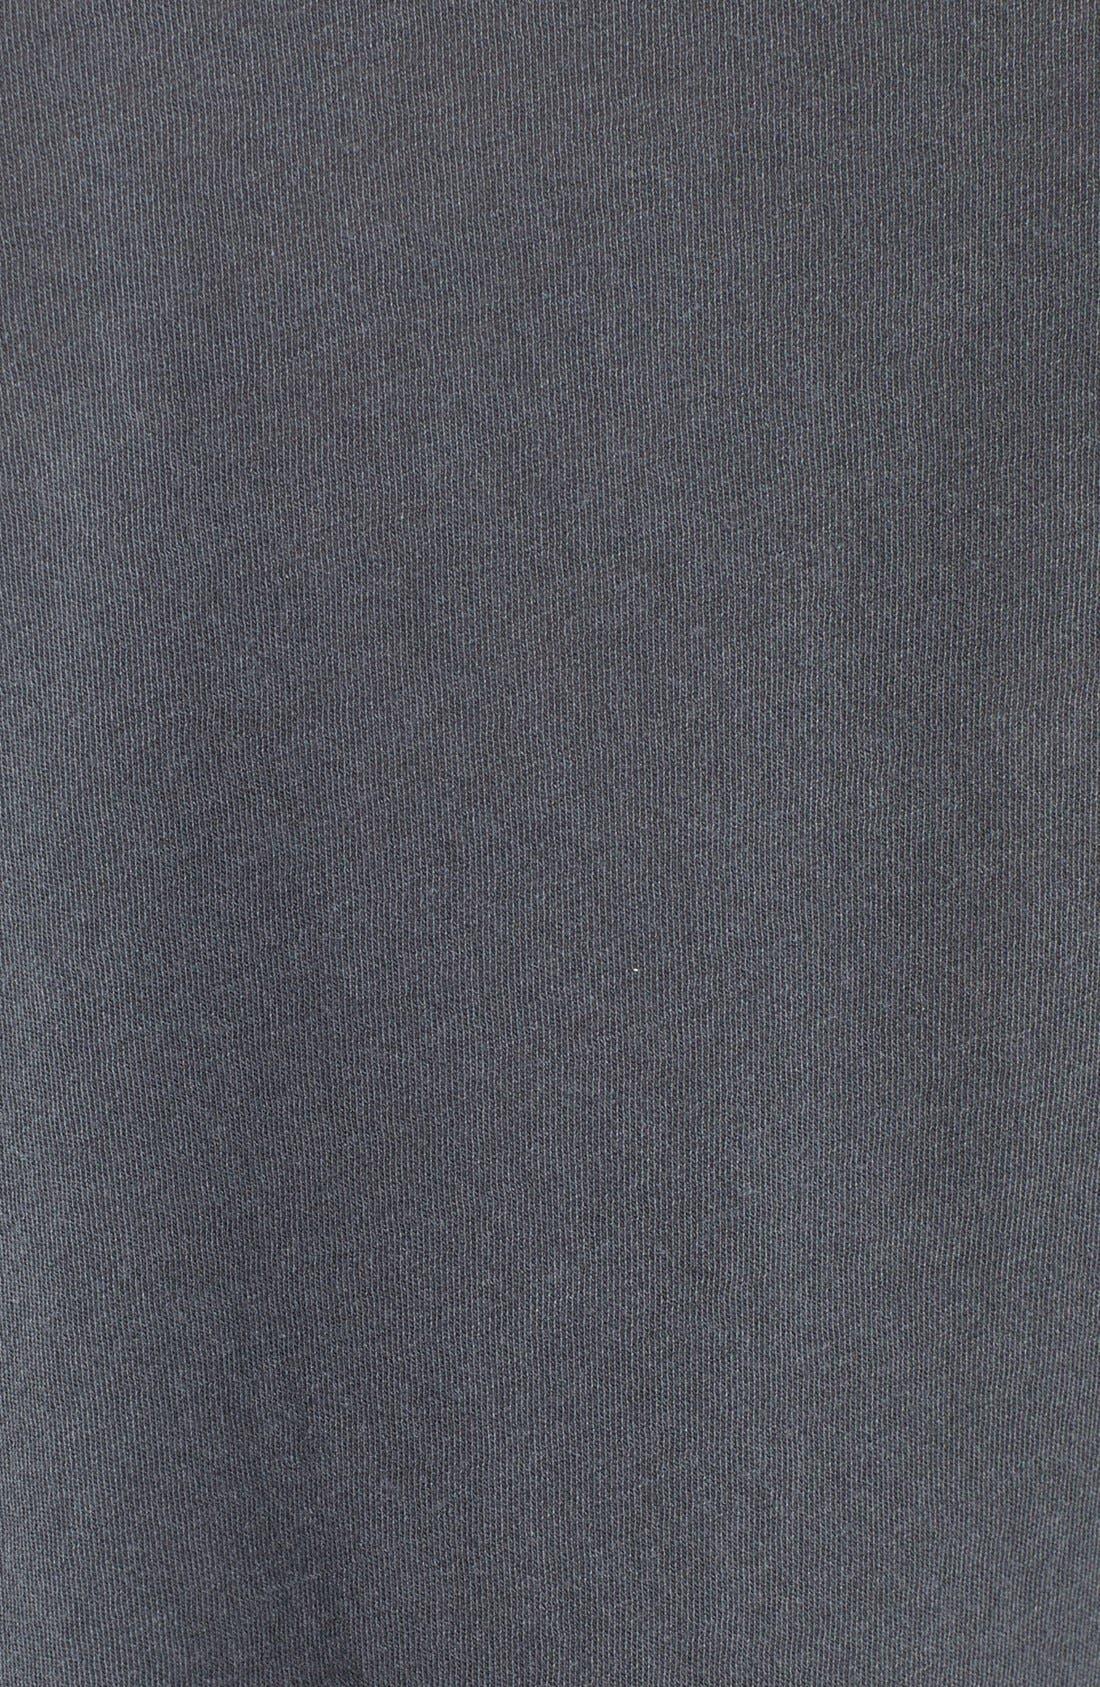 'Vintage Whisper' Cotton Tee,                             Alternate thumbnail 3, color,                             020